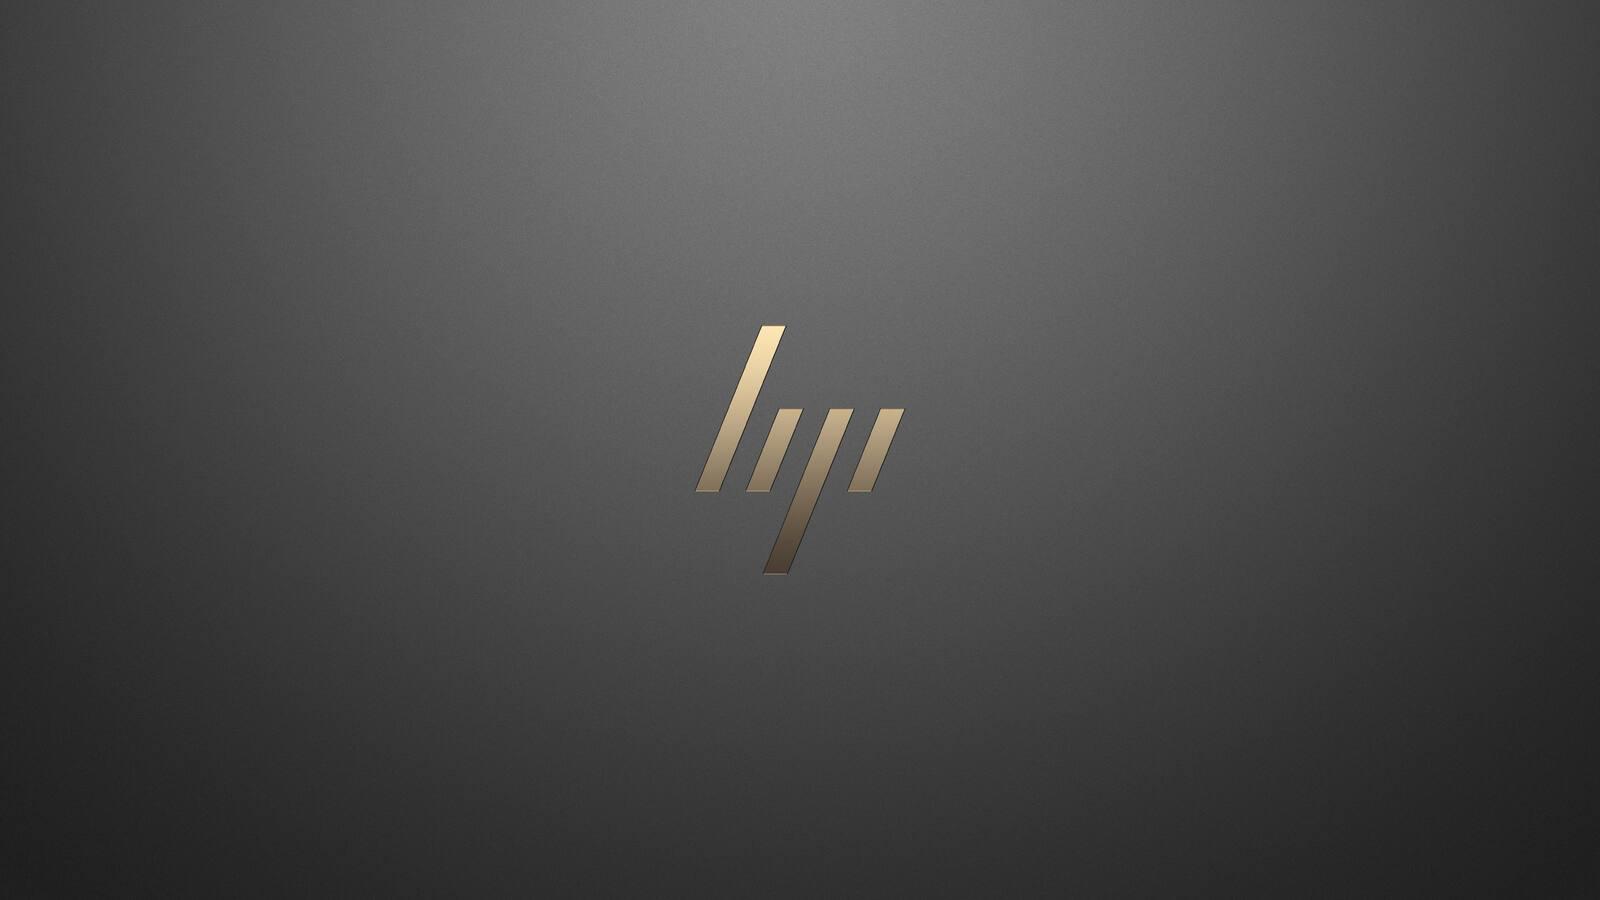 1600x900 Hp Spectre Logo 8k 1600x900 Resolution HD 4k